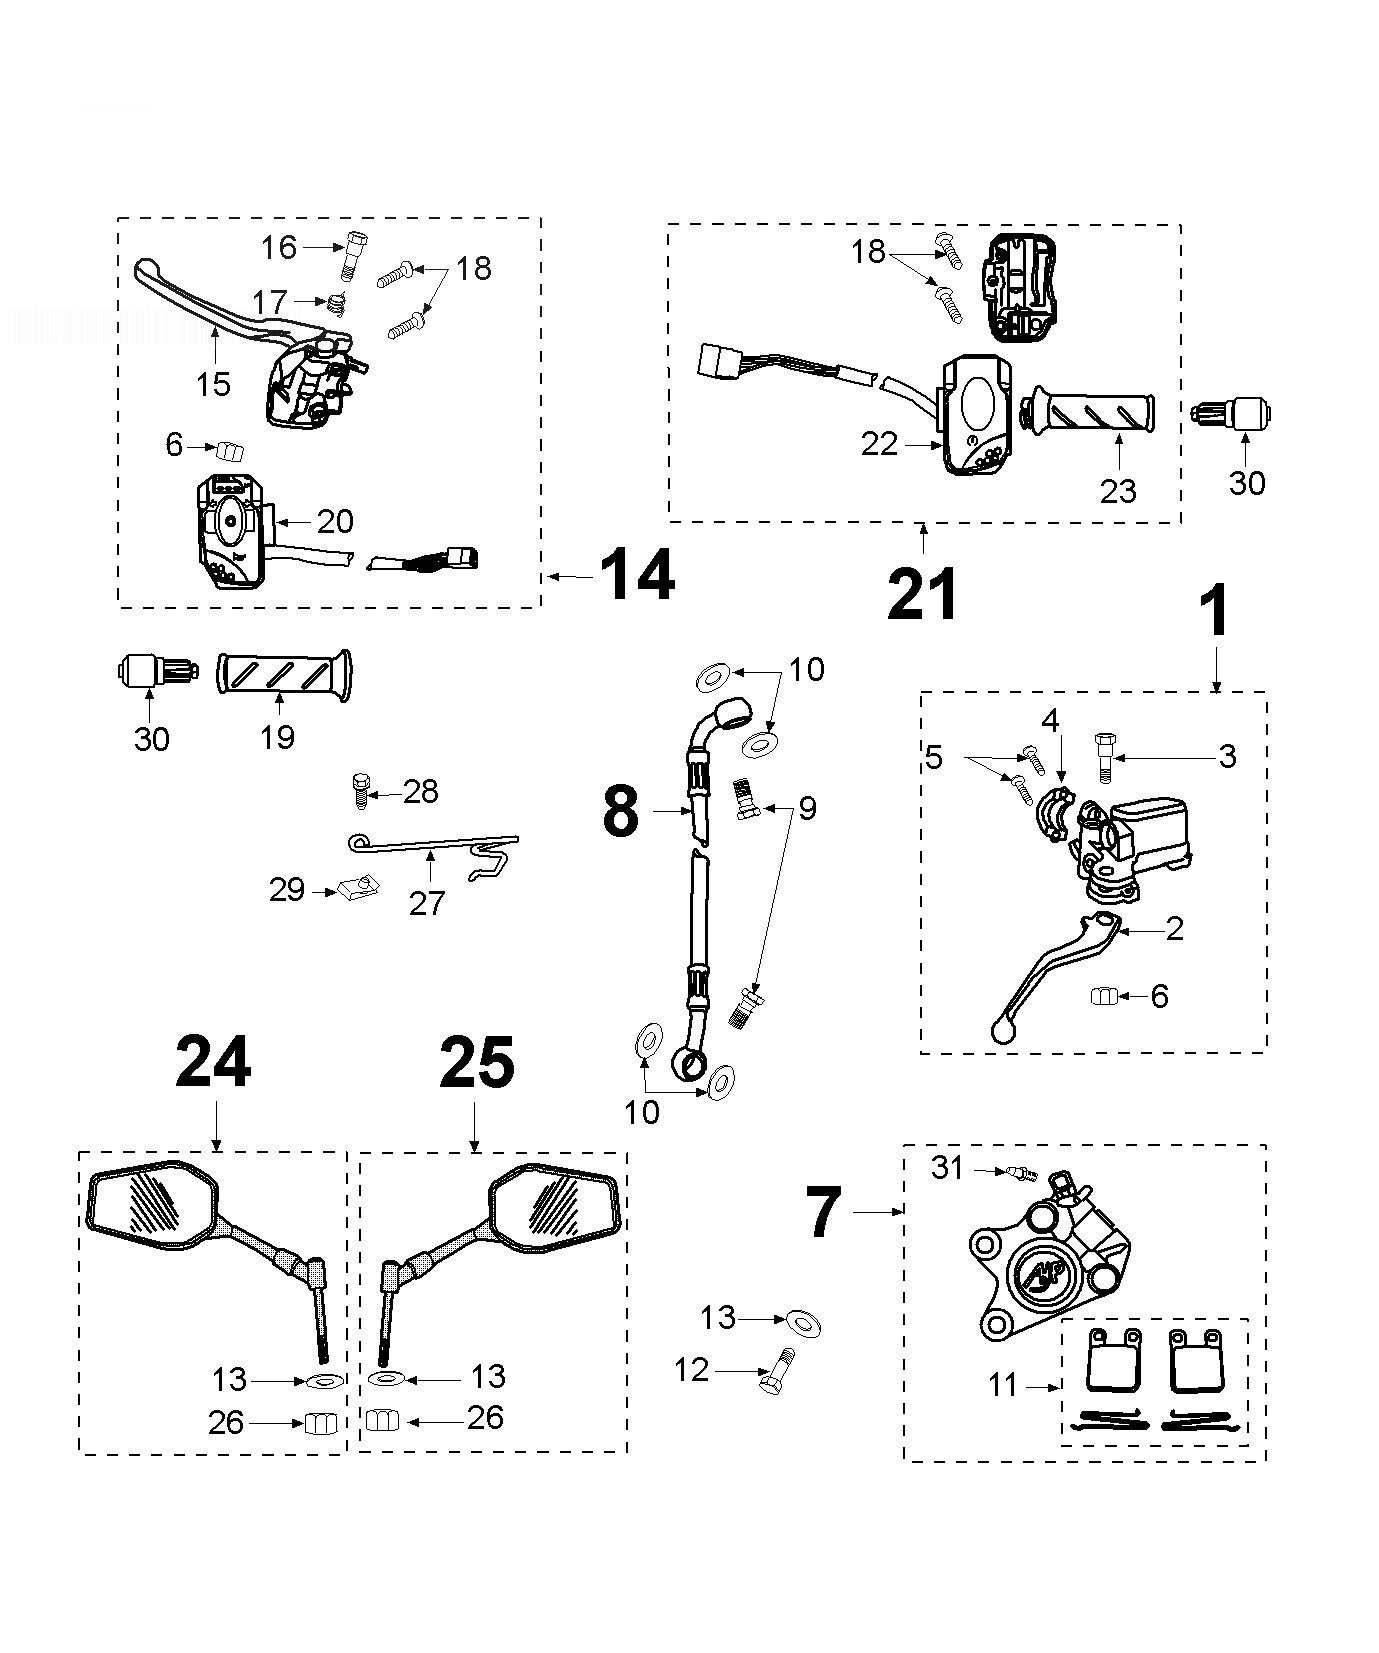 hight resolution of peugeot brake diagram